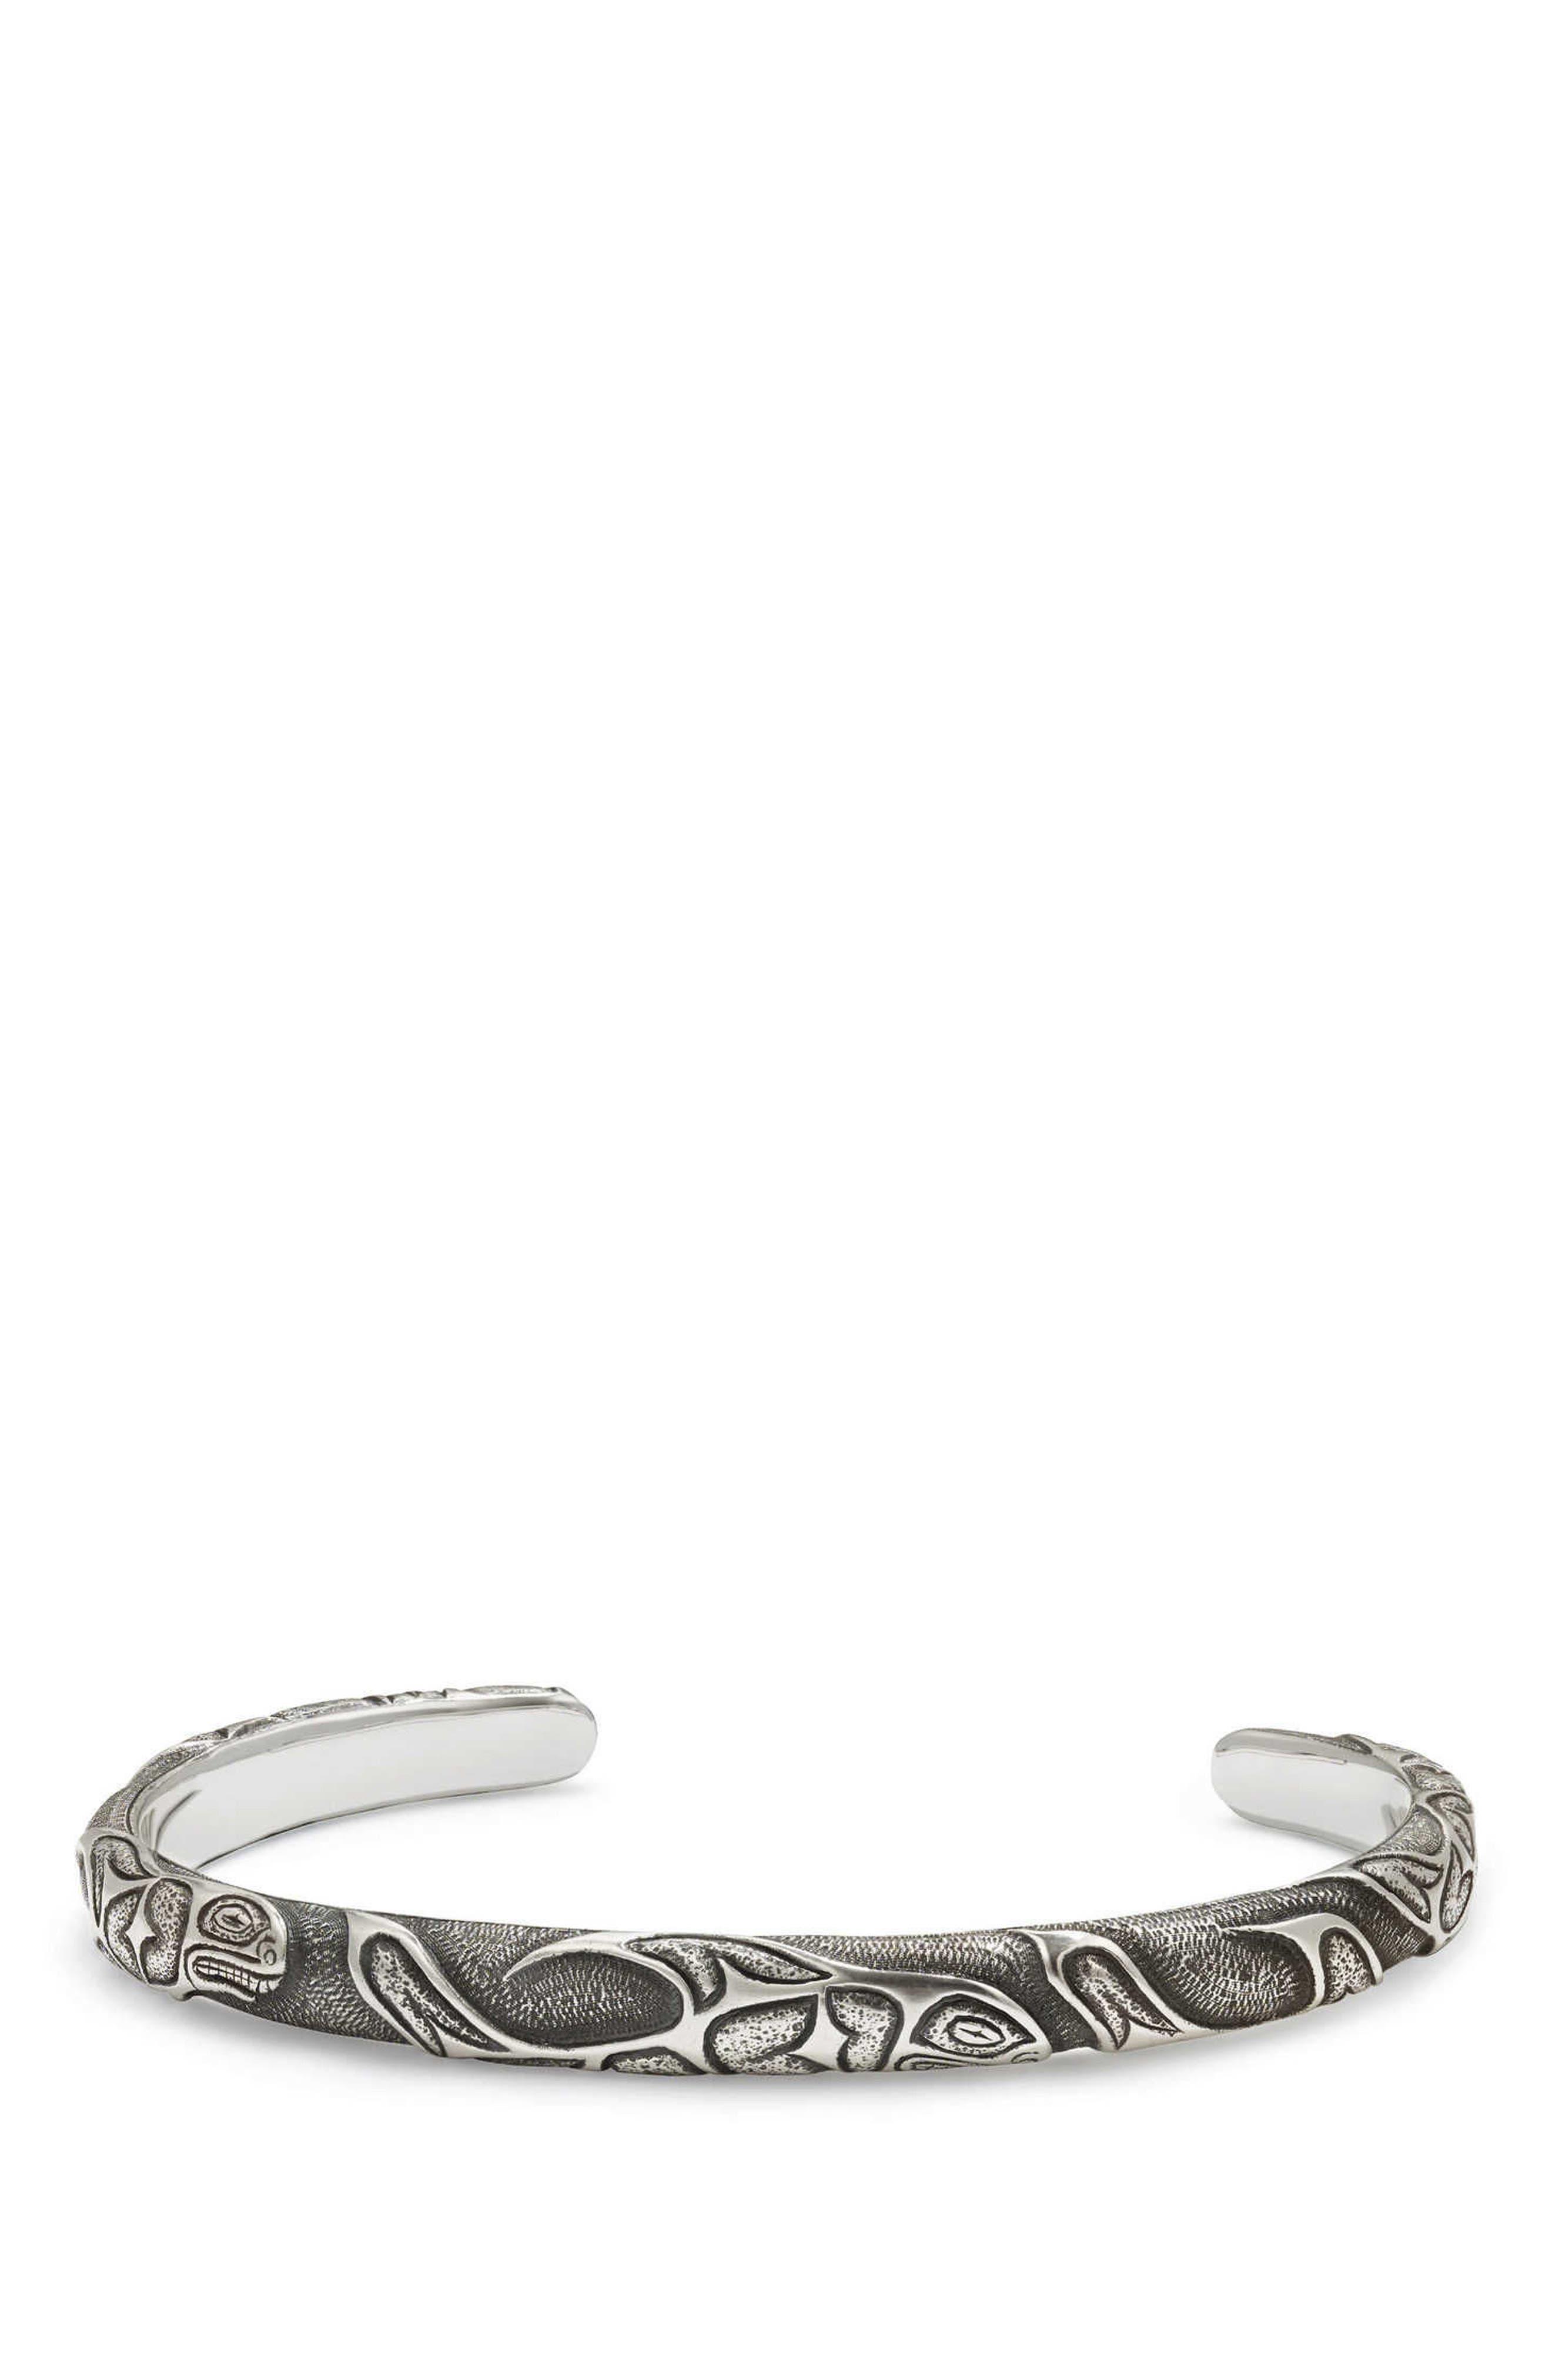 DAVID YURMAN Northwest Narrow Cuff Bracelet, Main, color, SILVER